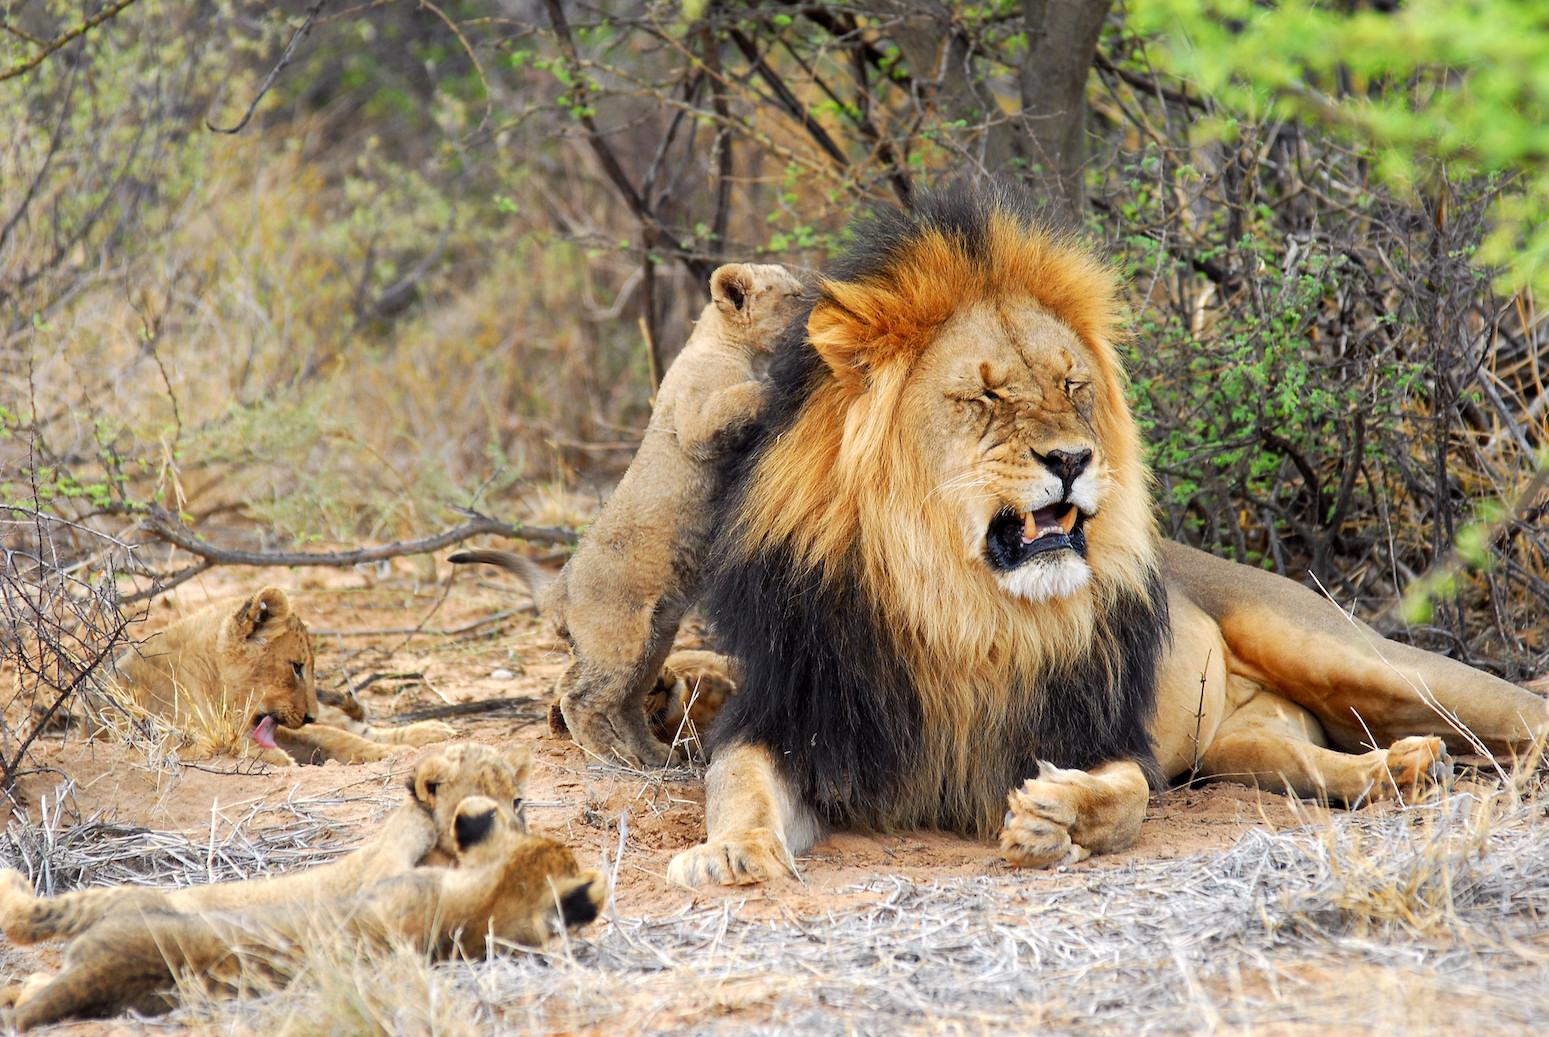 Black maned male lion and cubs - Tswalu Kalahari, South Africa - Ashworth  Africa